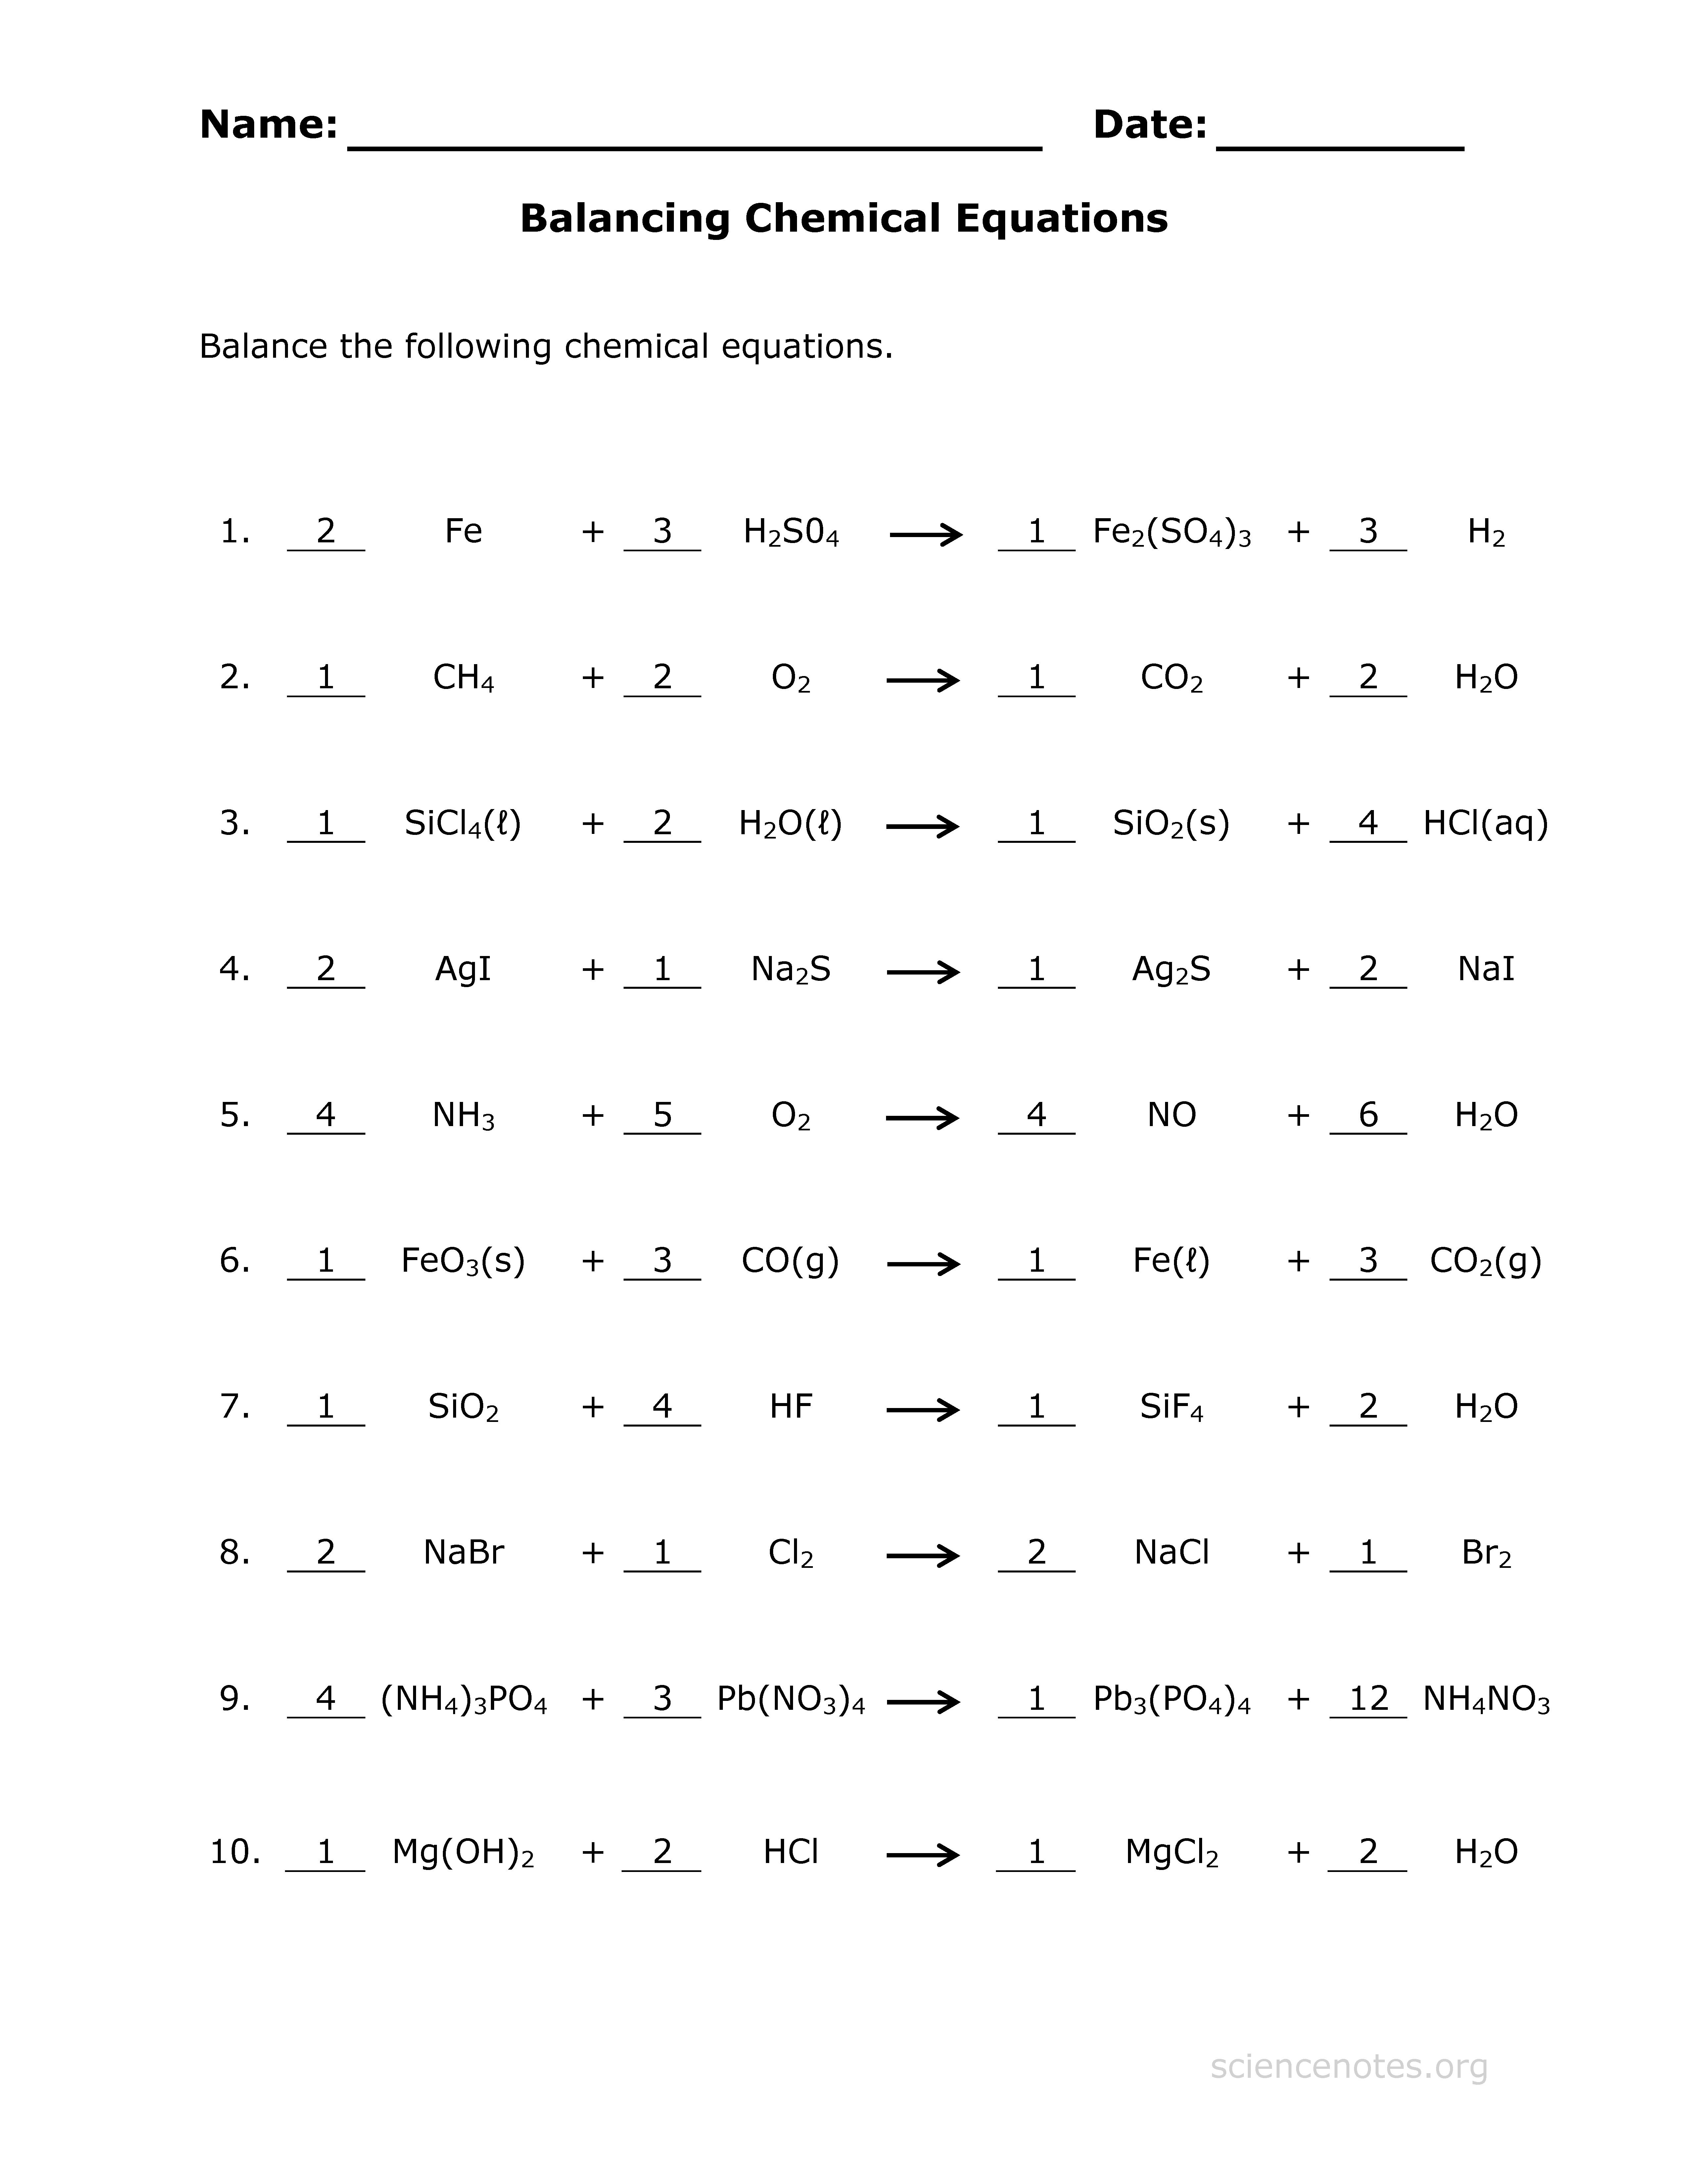 Balancing Equations Worksheet Easy The Best Worksheets Image